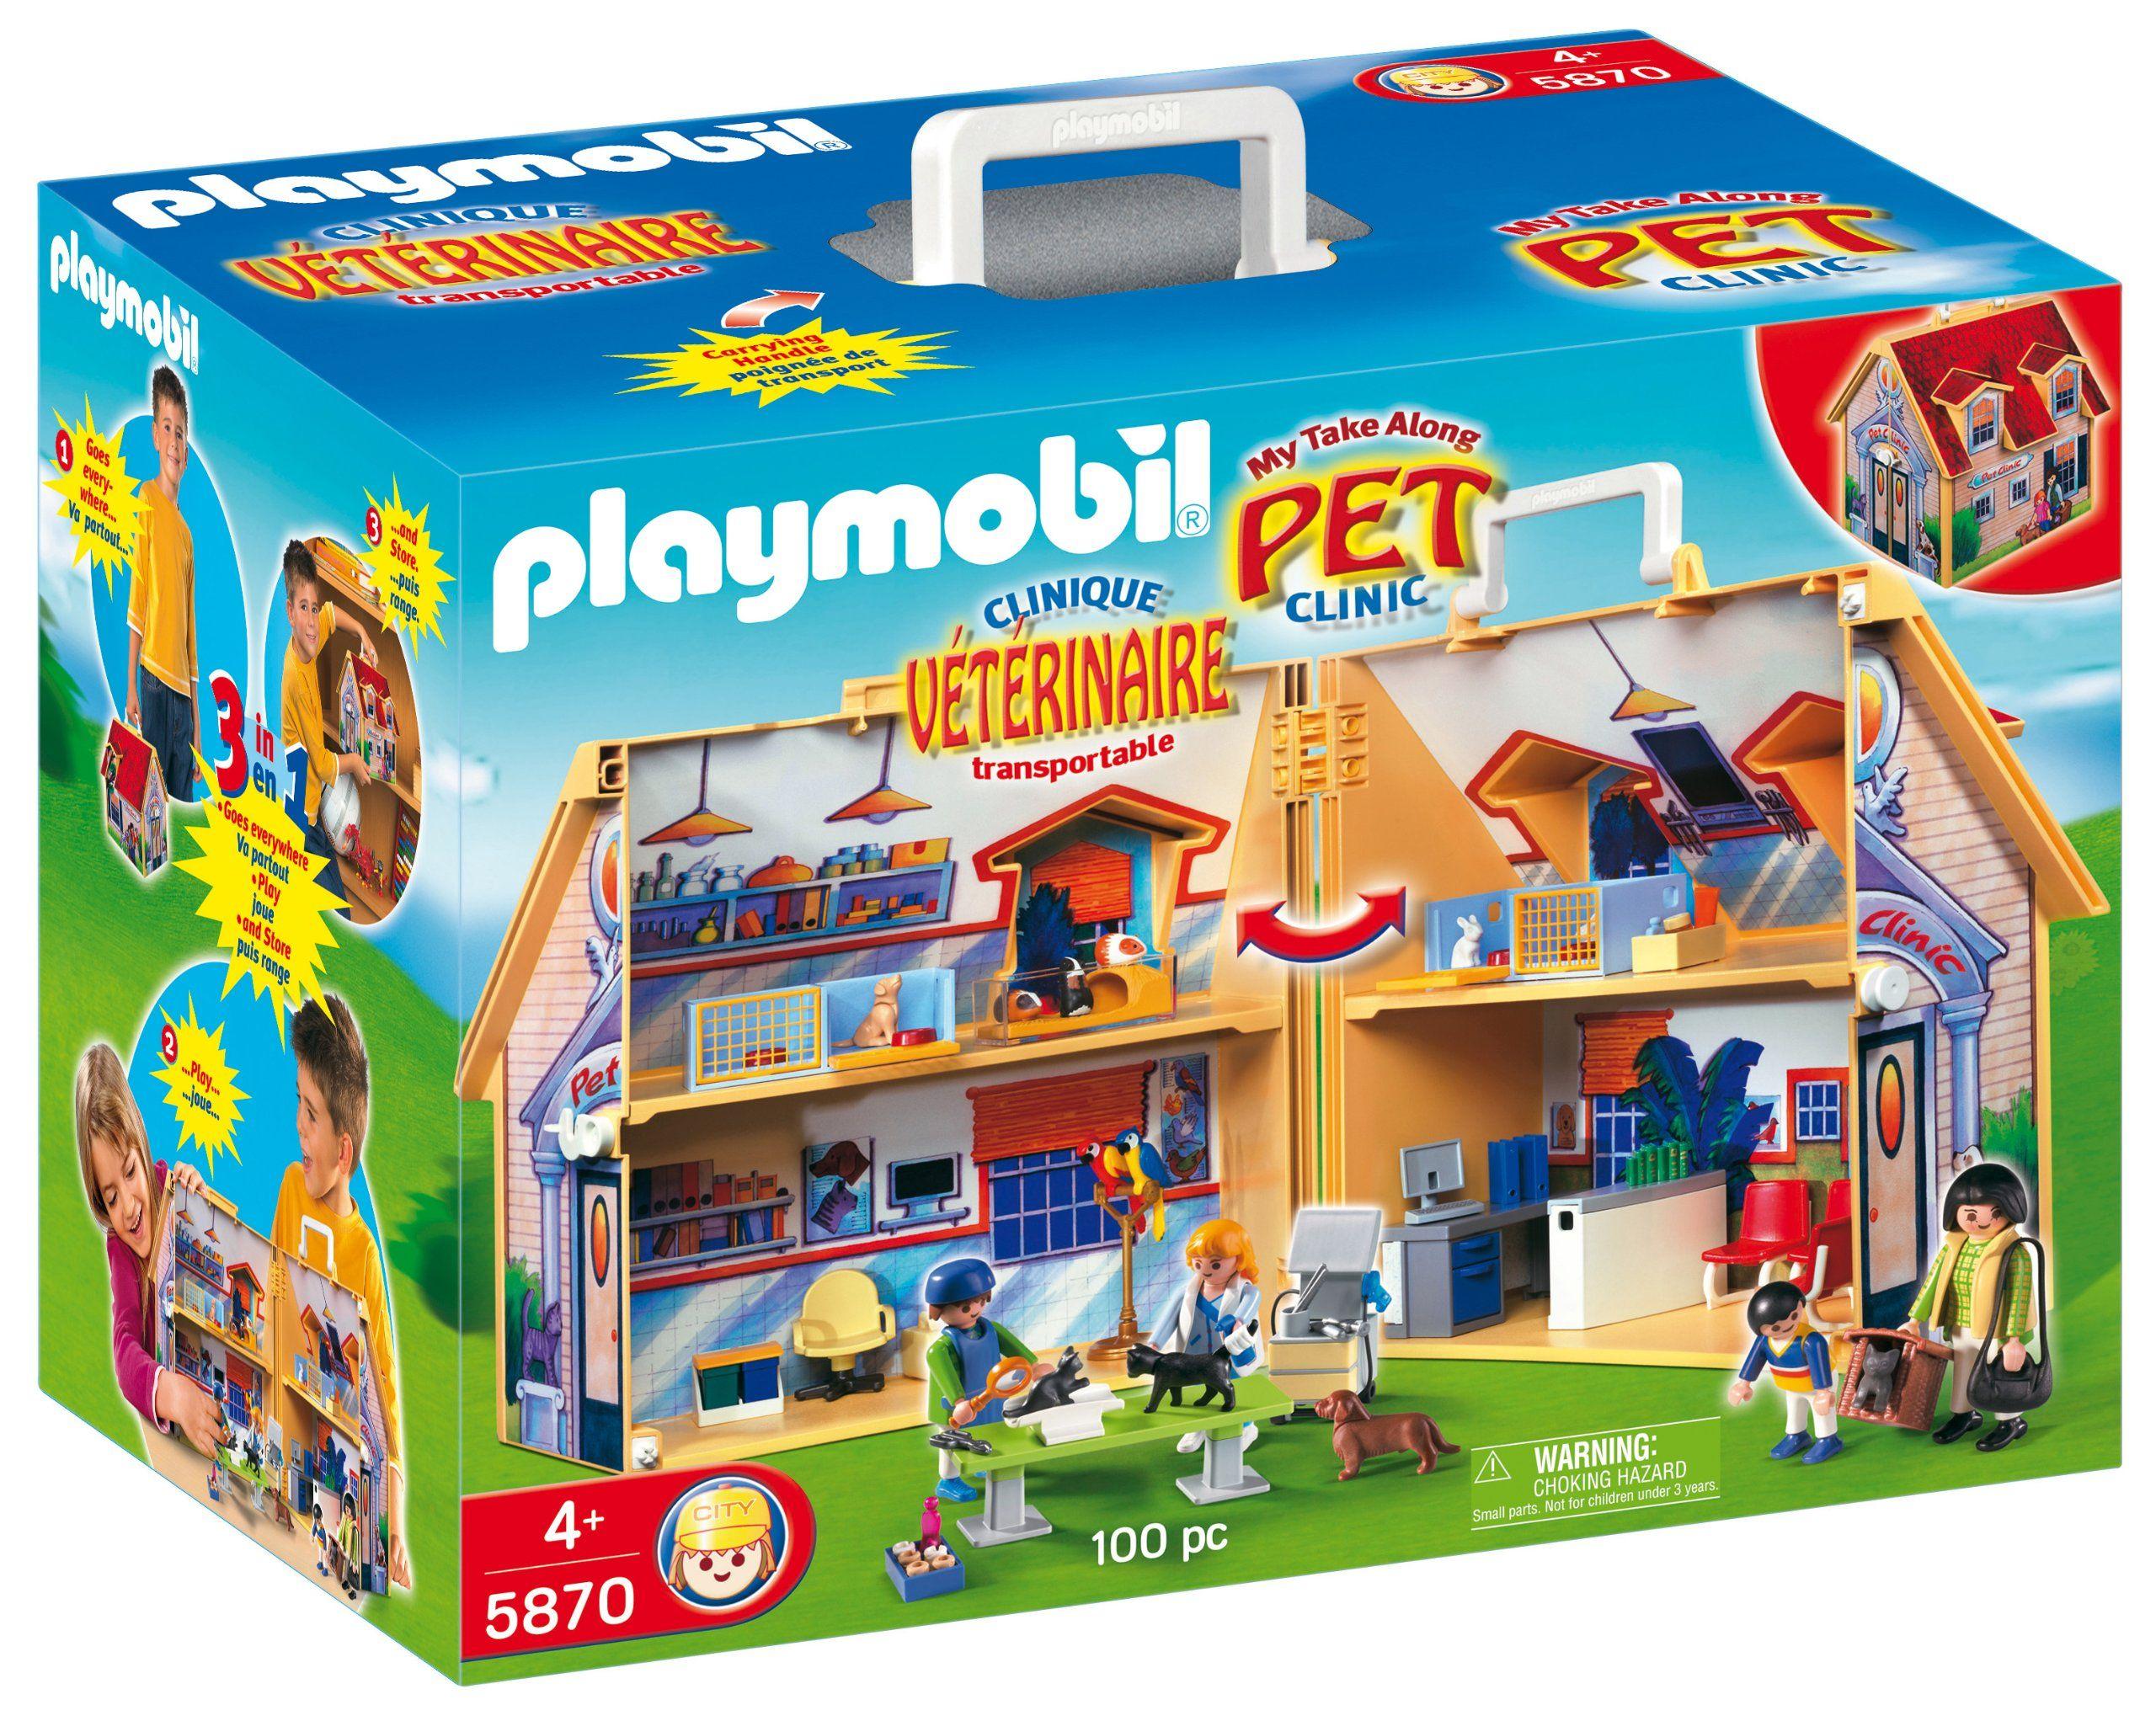 Playmobil My Take Along Pet Clinic Pet clinic, Playmobil